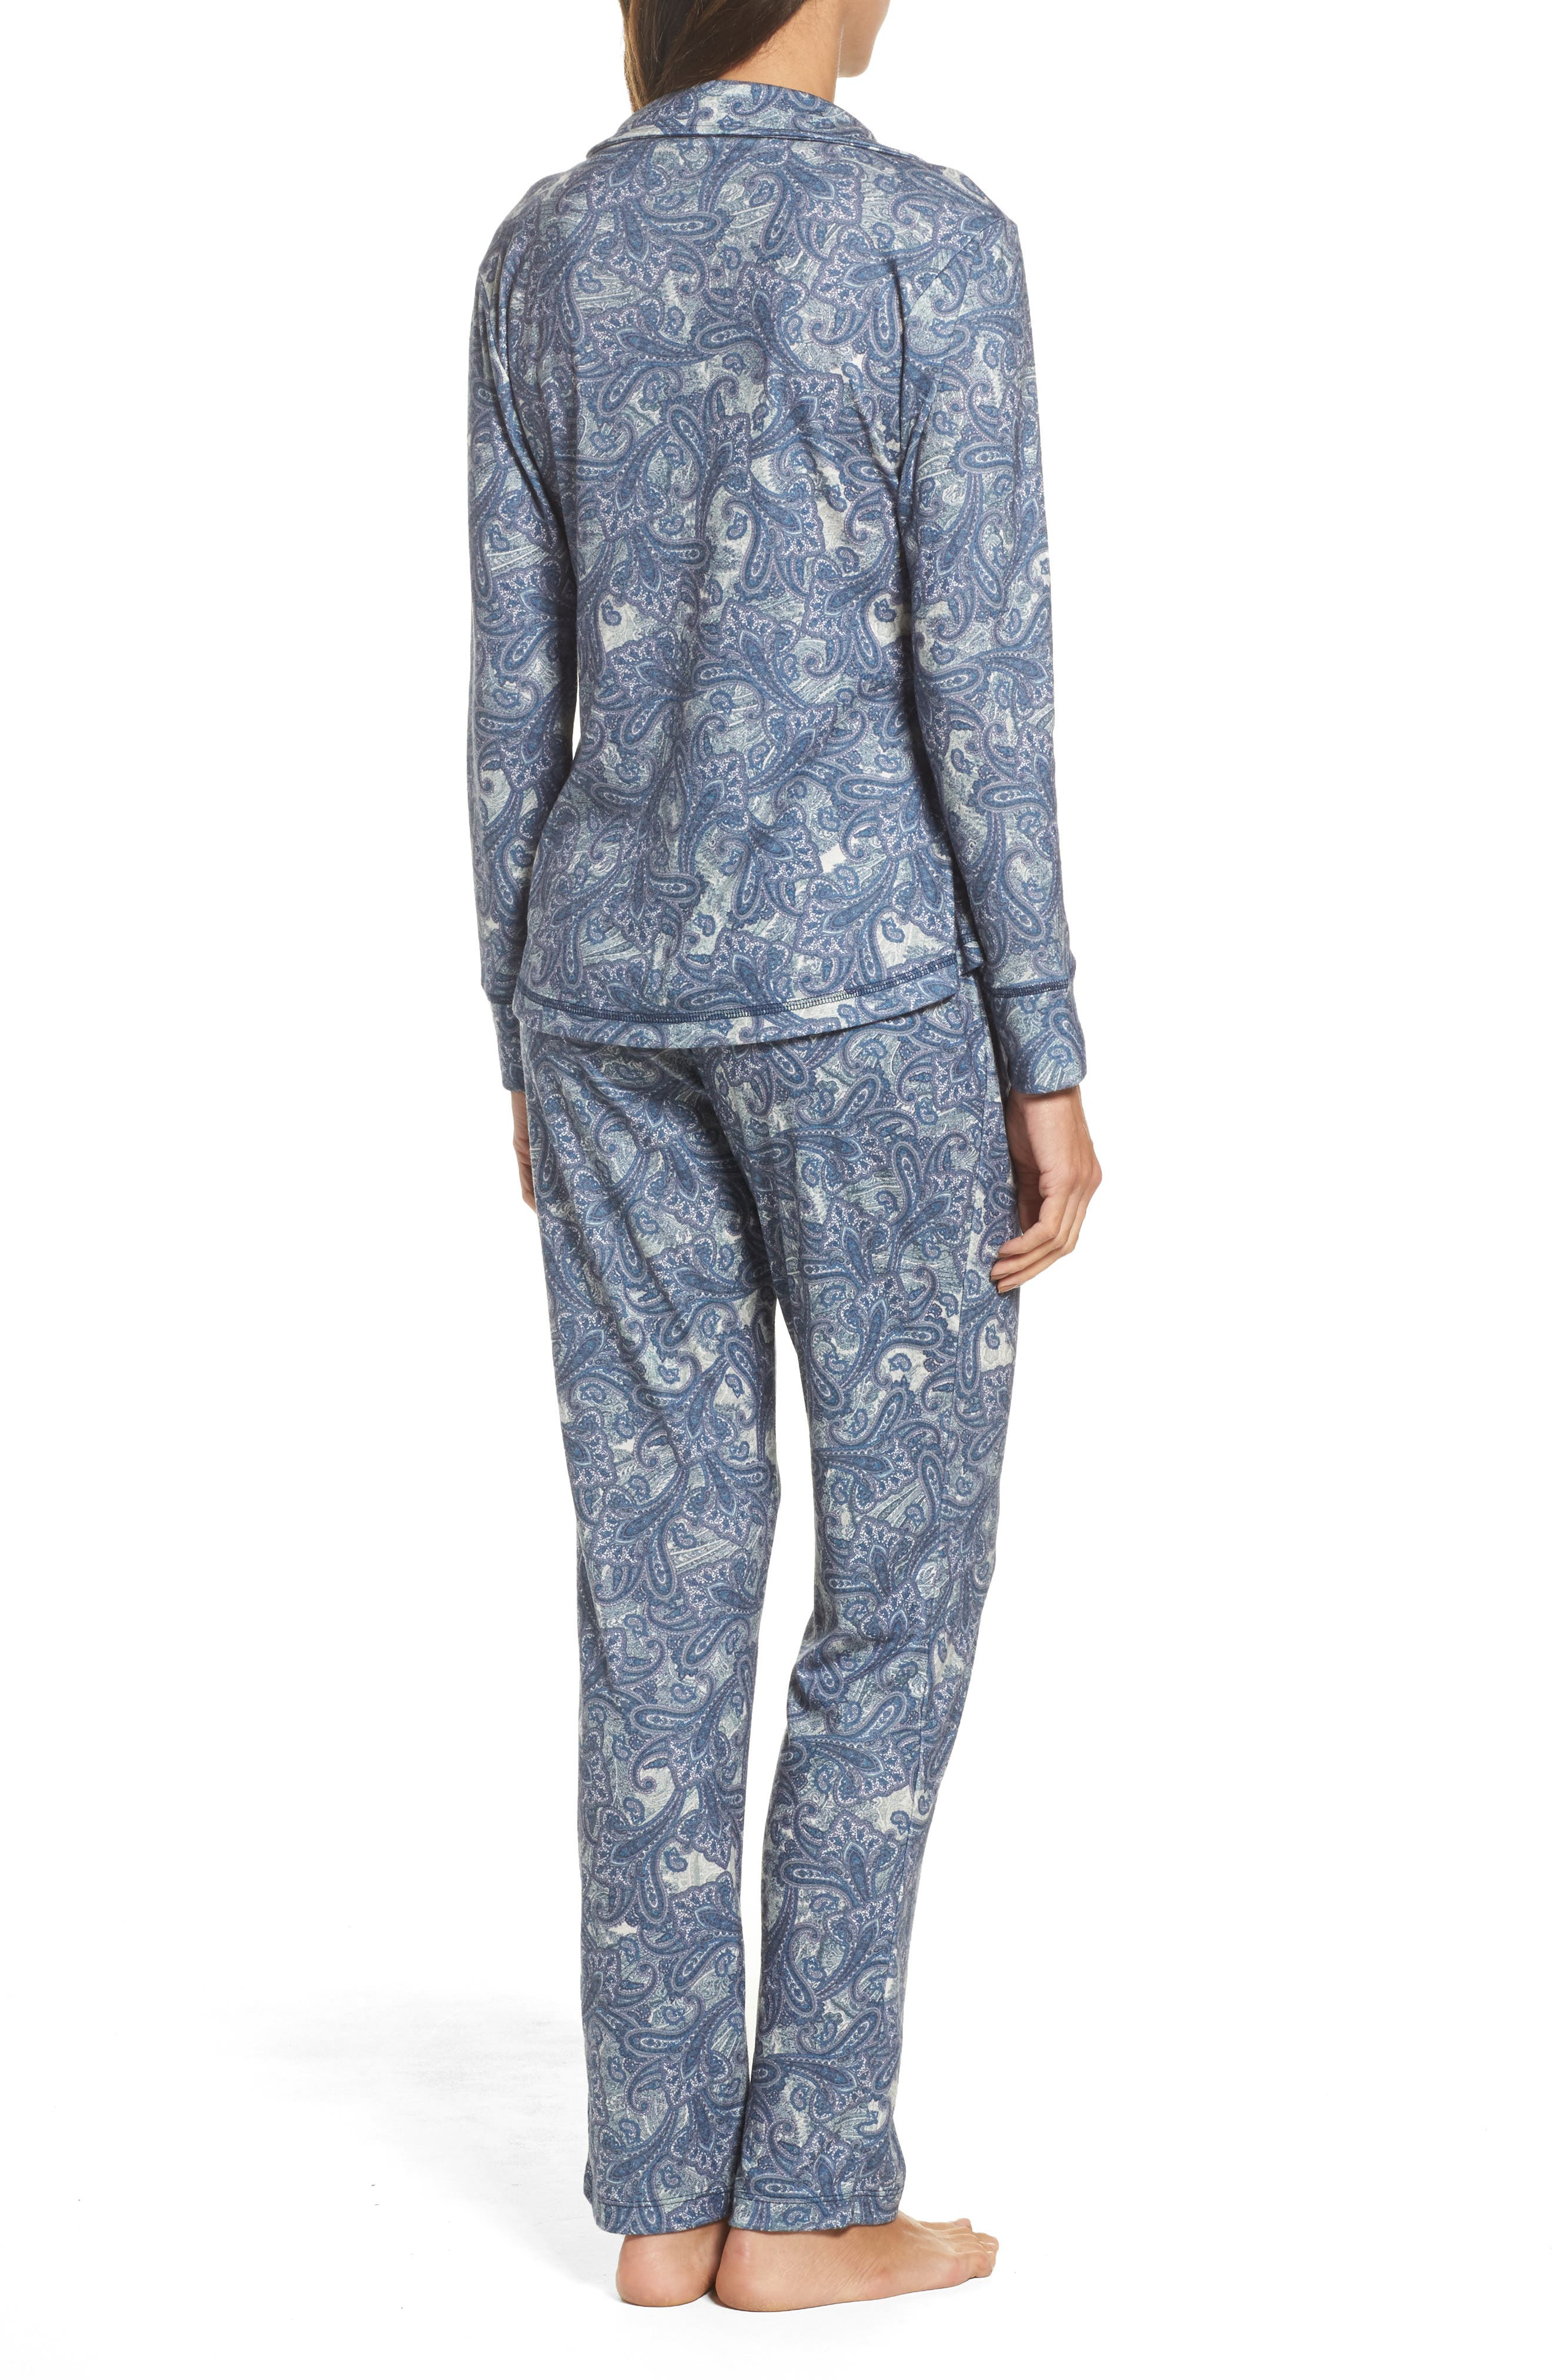 Clara Flannel Pajamas,                             Alternate thumbnail 2, color,                             400